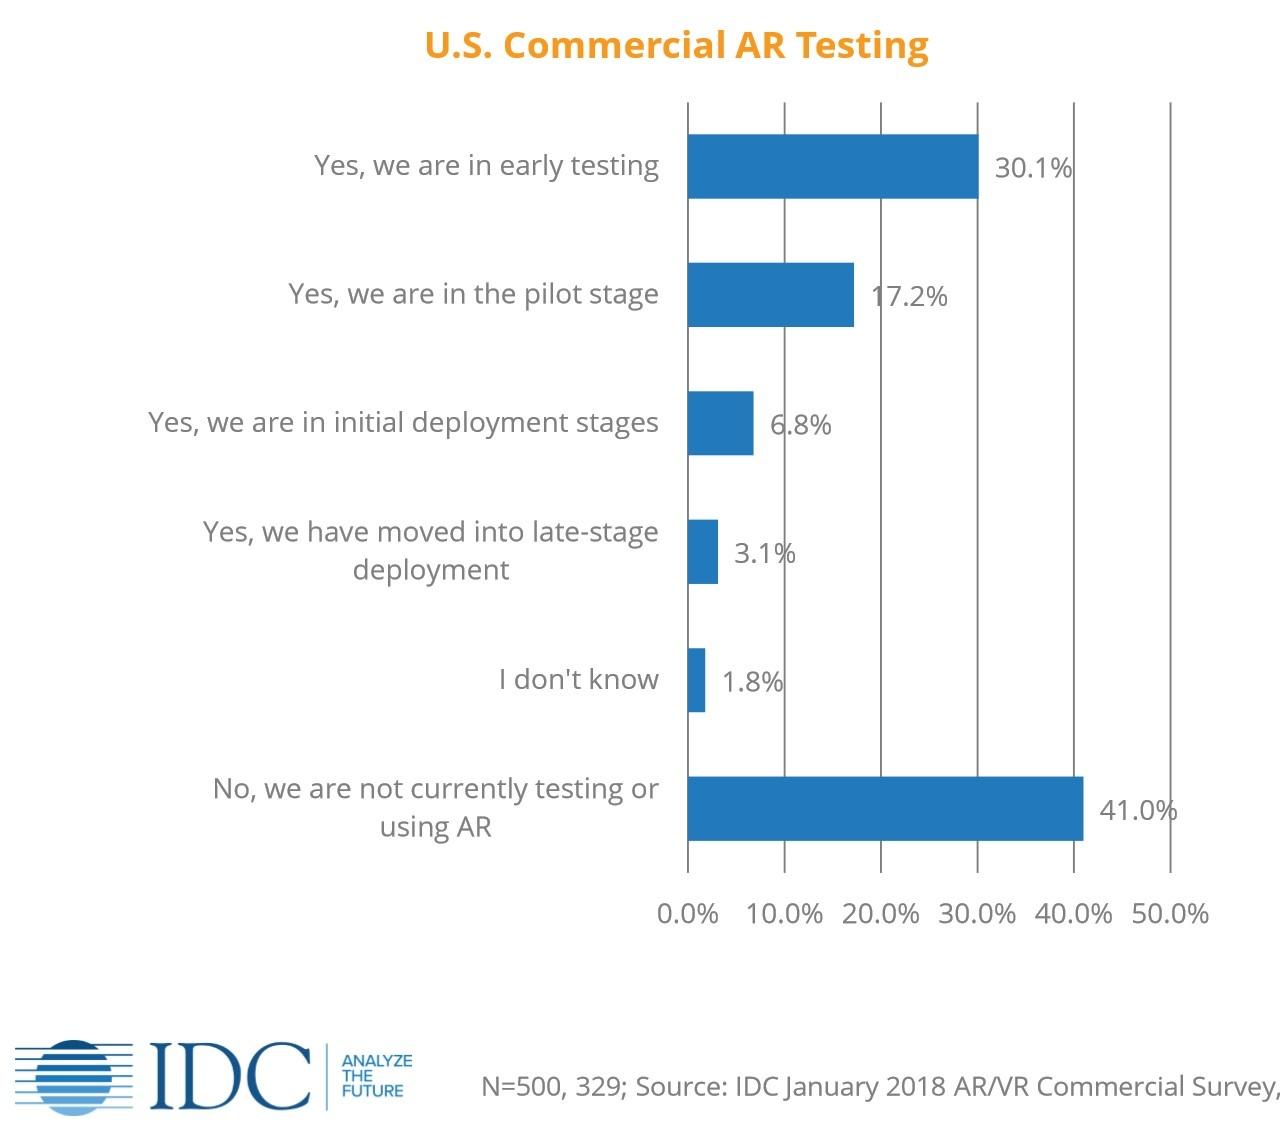 IDC testing